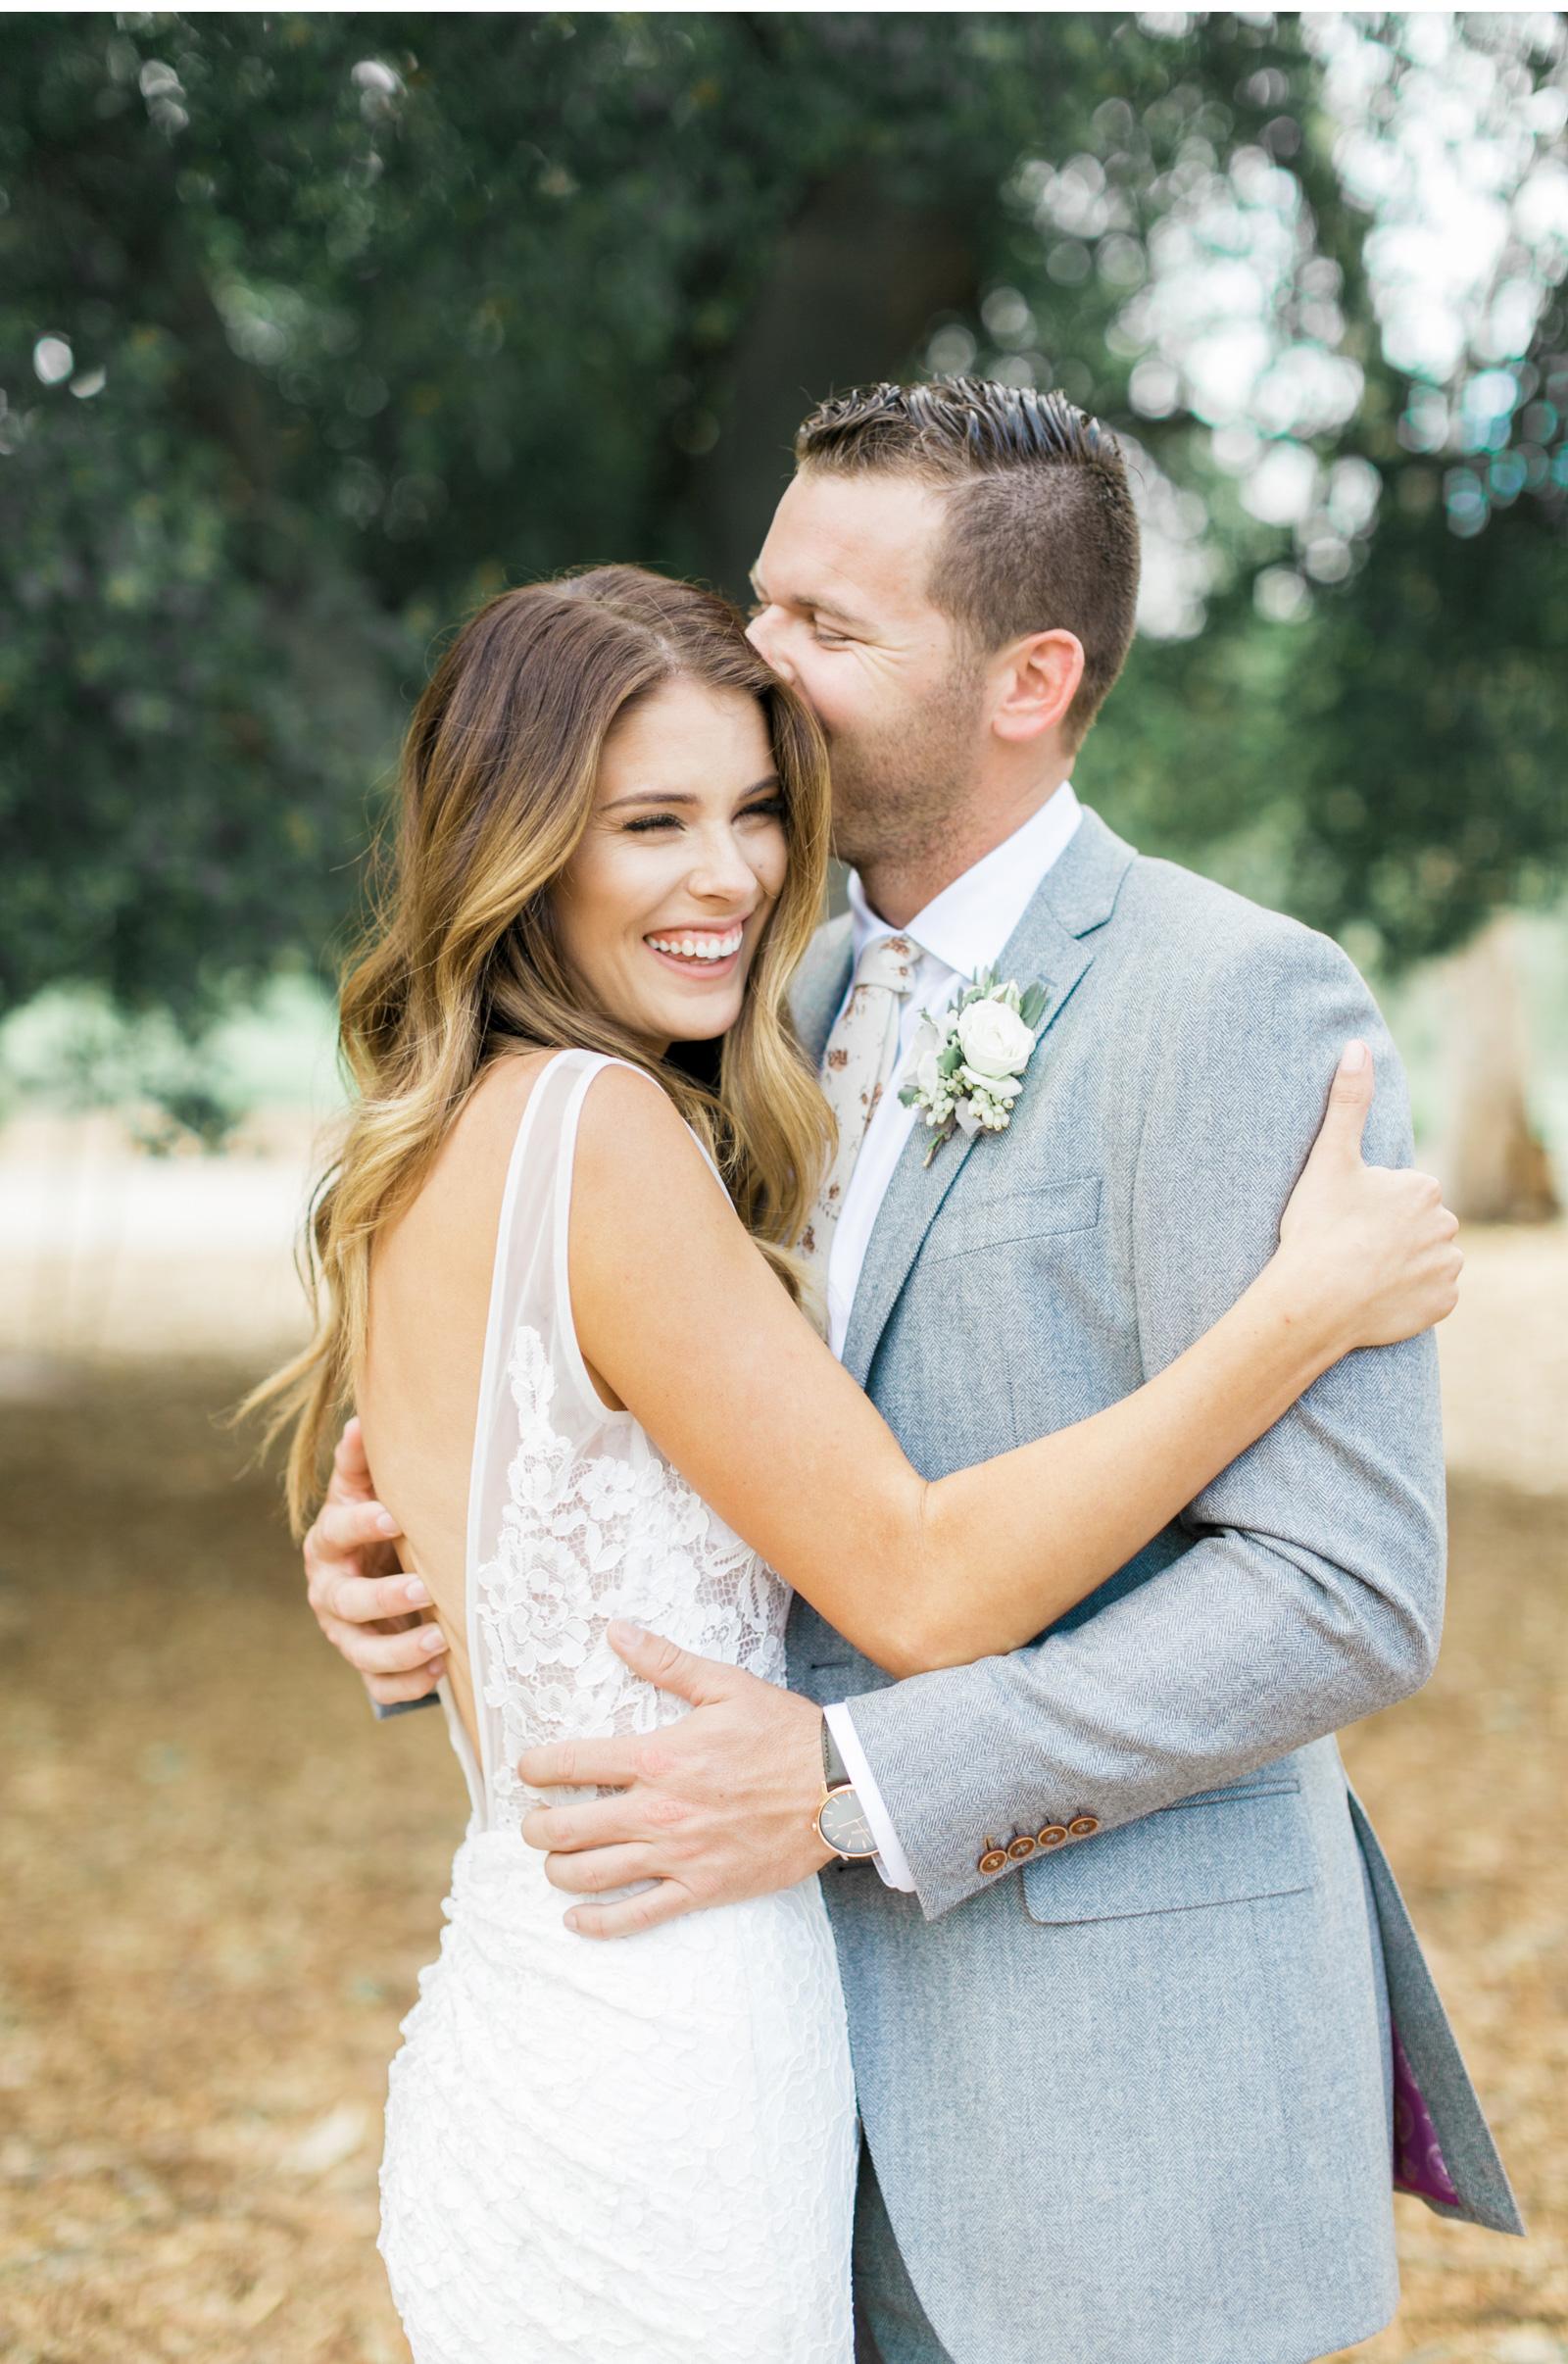 Malibu-Wedding-Photographer-Saddlerock-Ranch-Triunfo-Creek-Style-Me-Pretty_17.jpg